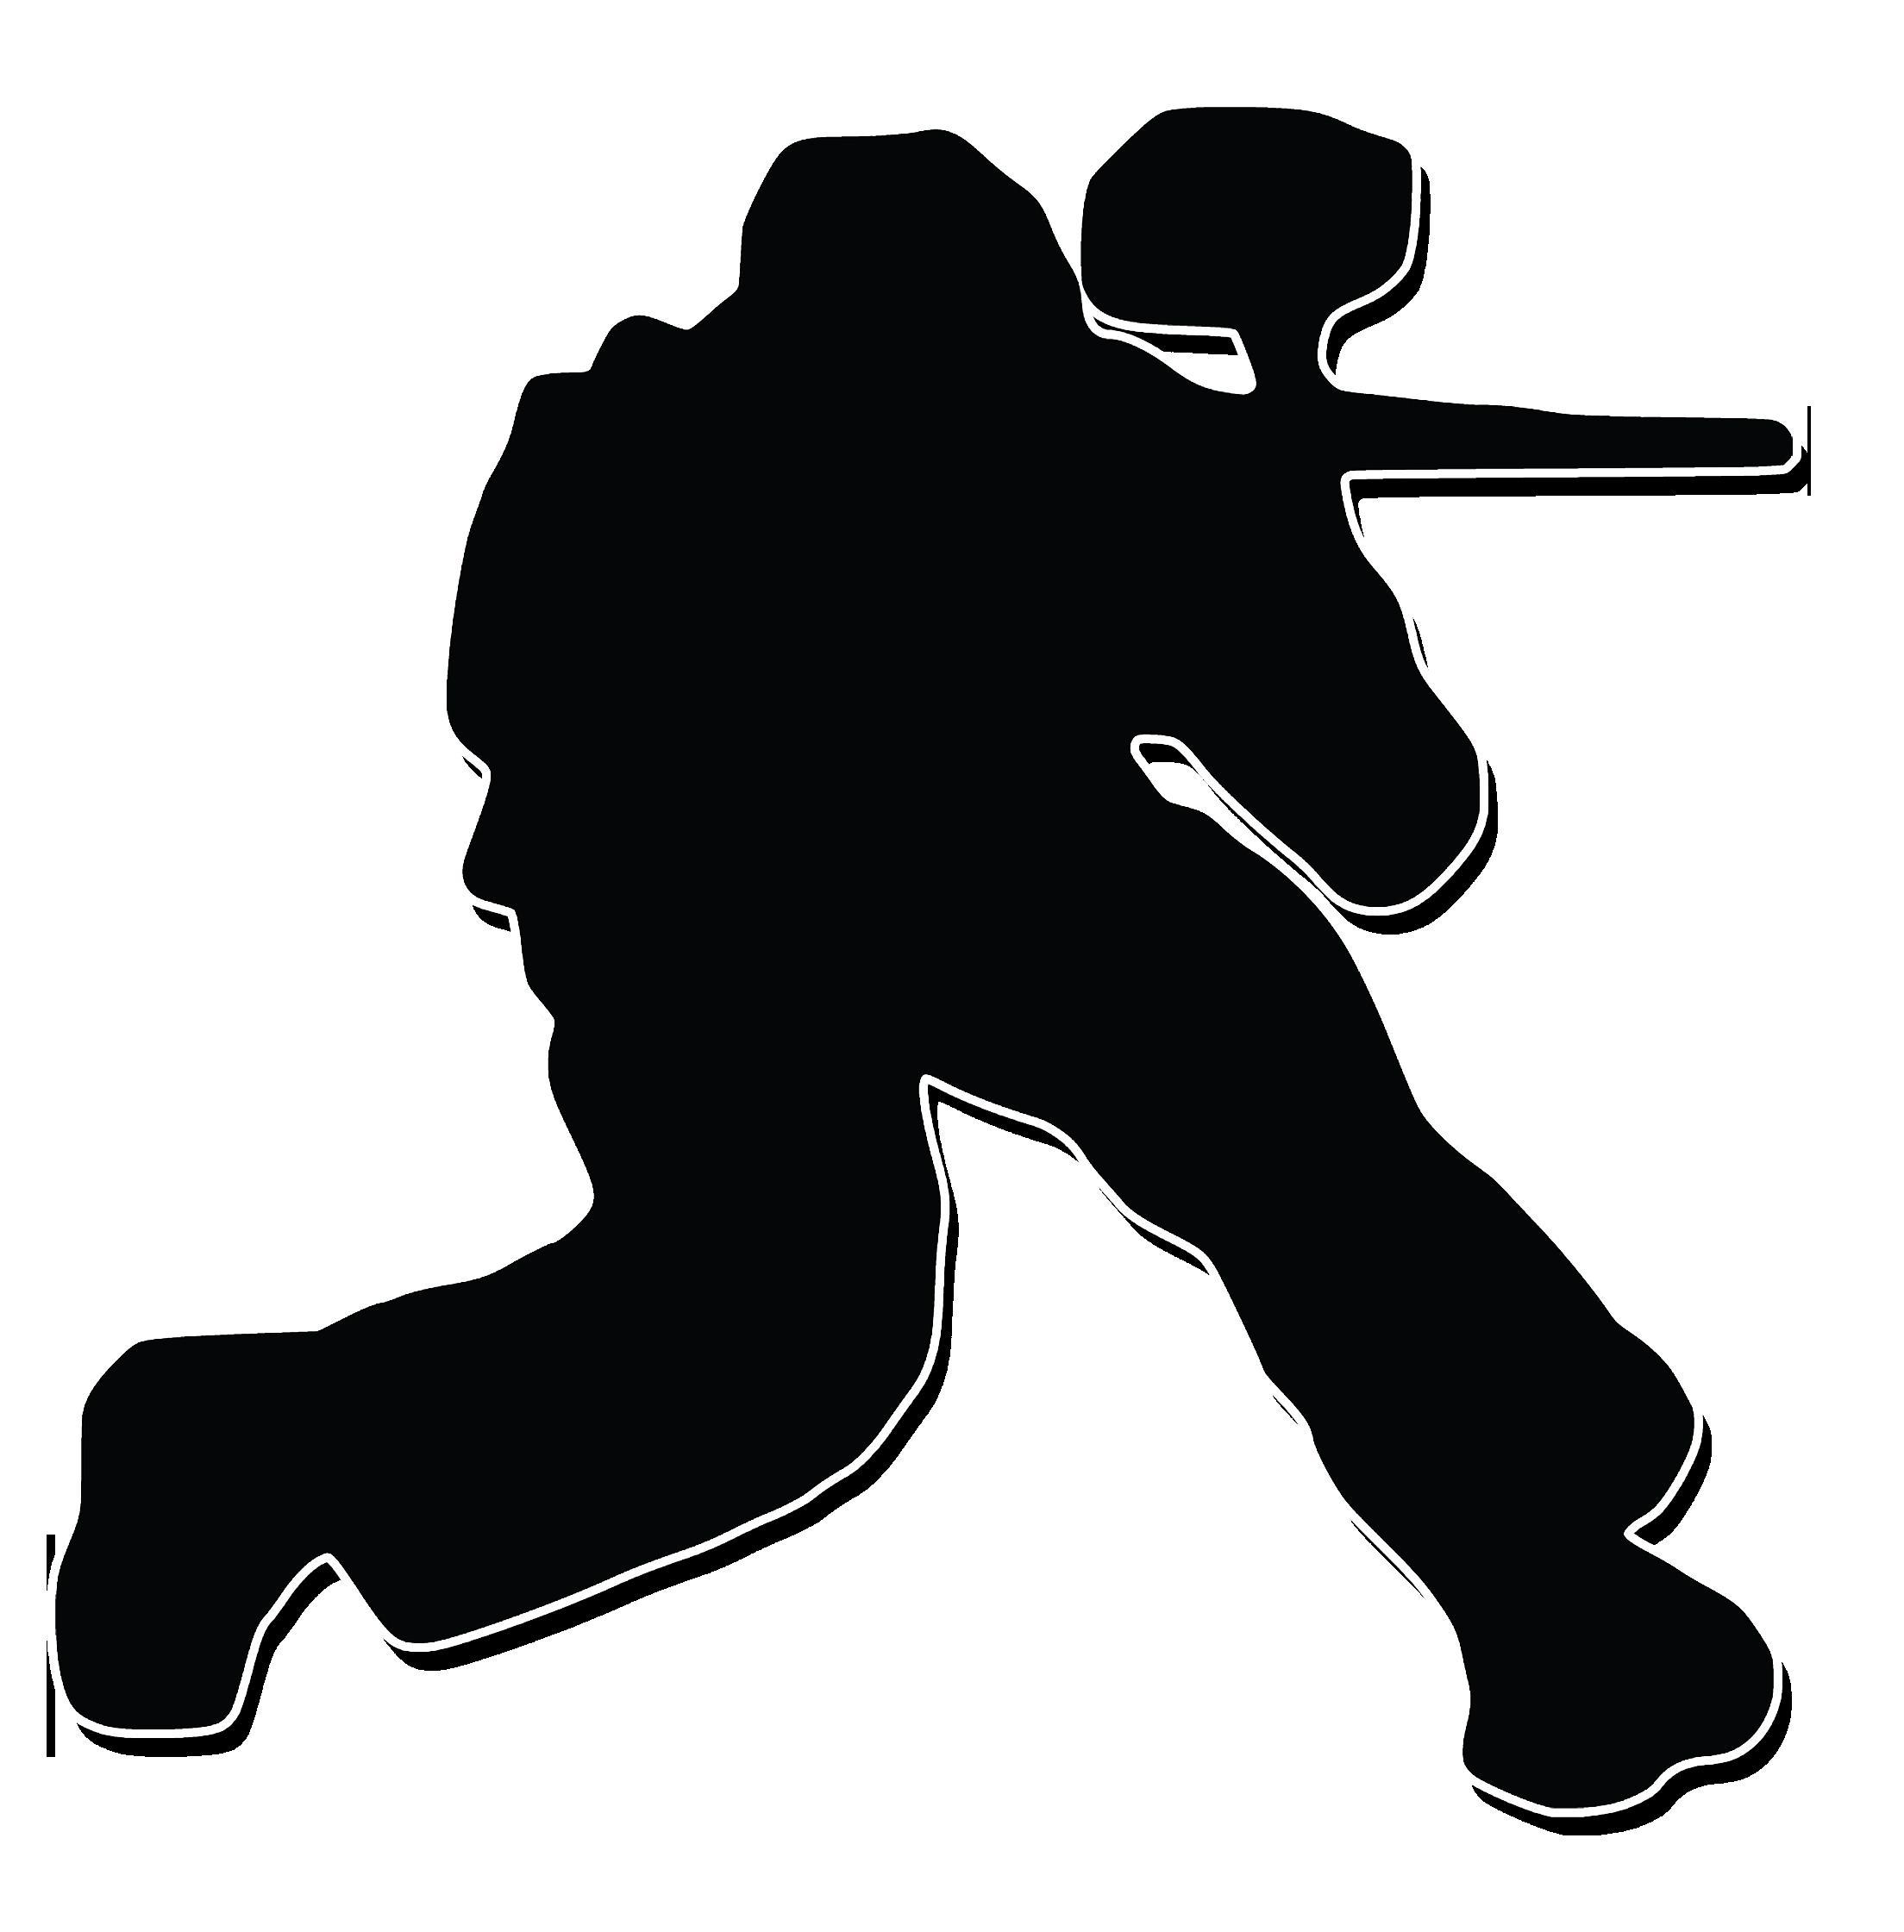 Pro Paintball Shop Silhouette Paintball Guns Stencil.